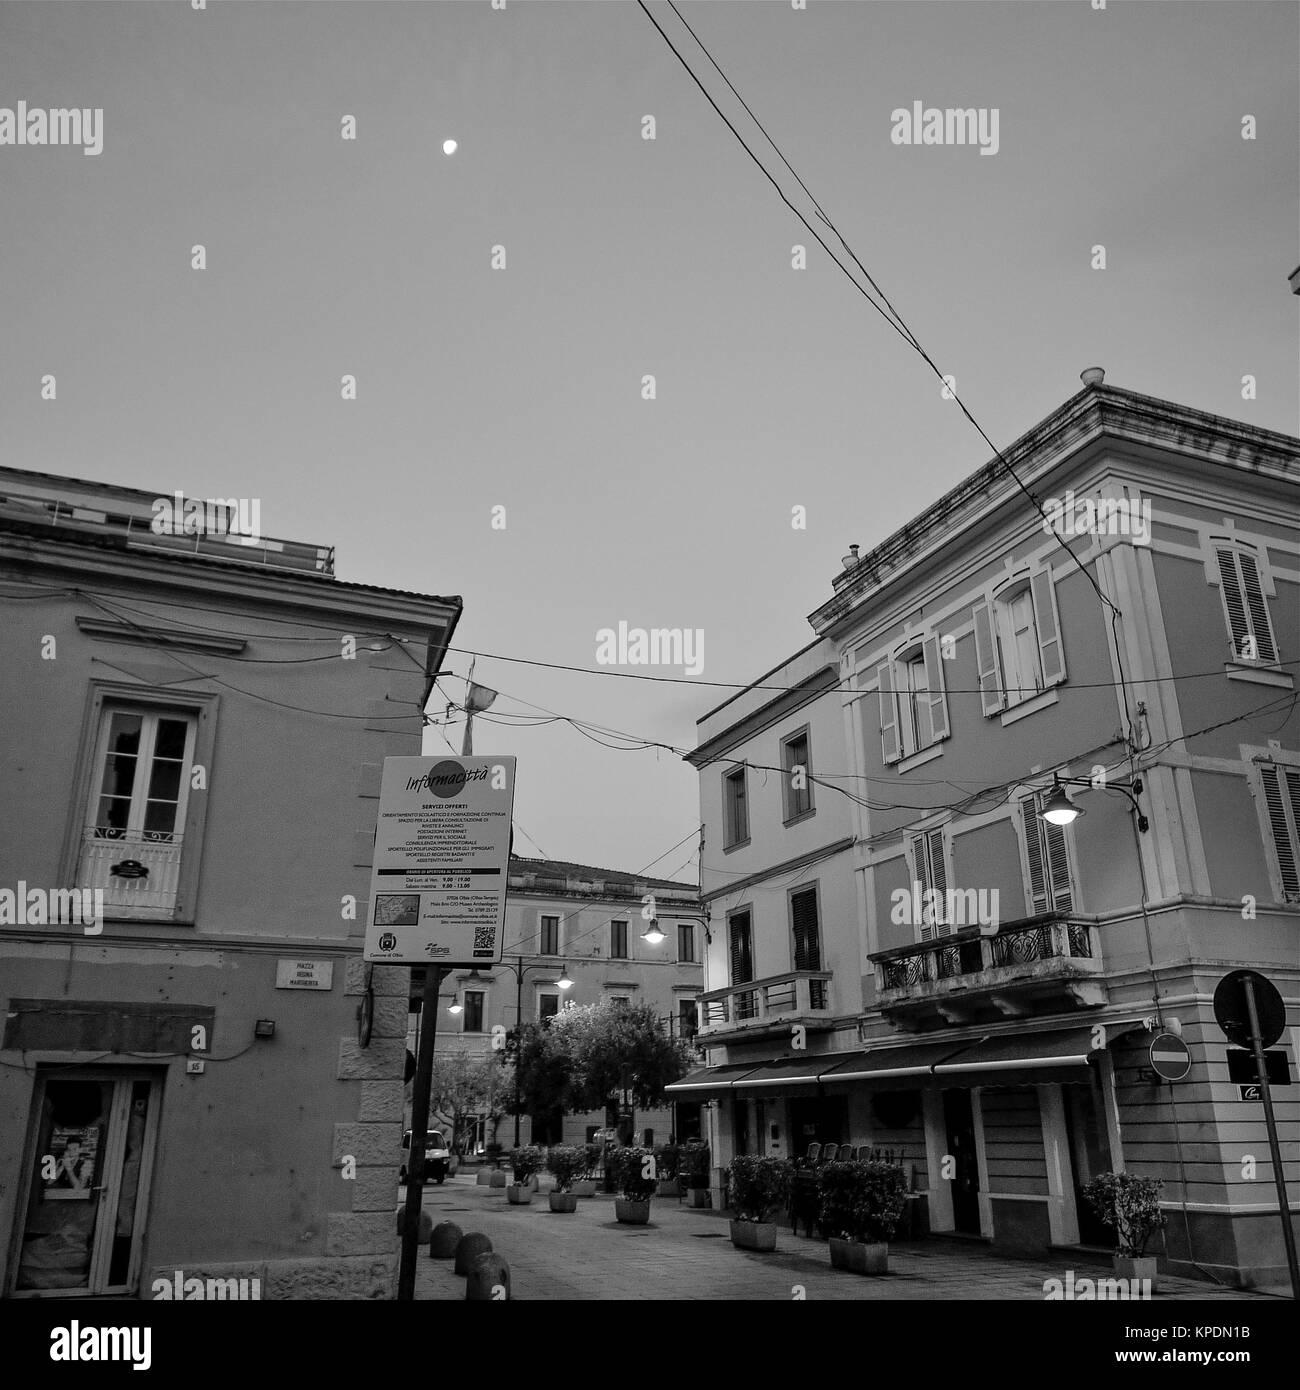 Black and white square view of Olbia, Sardinia, Italy - Stock Image